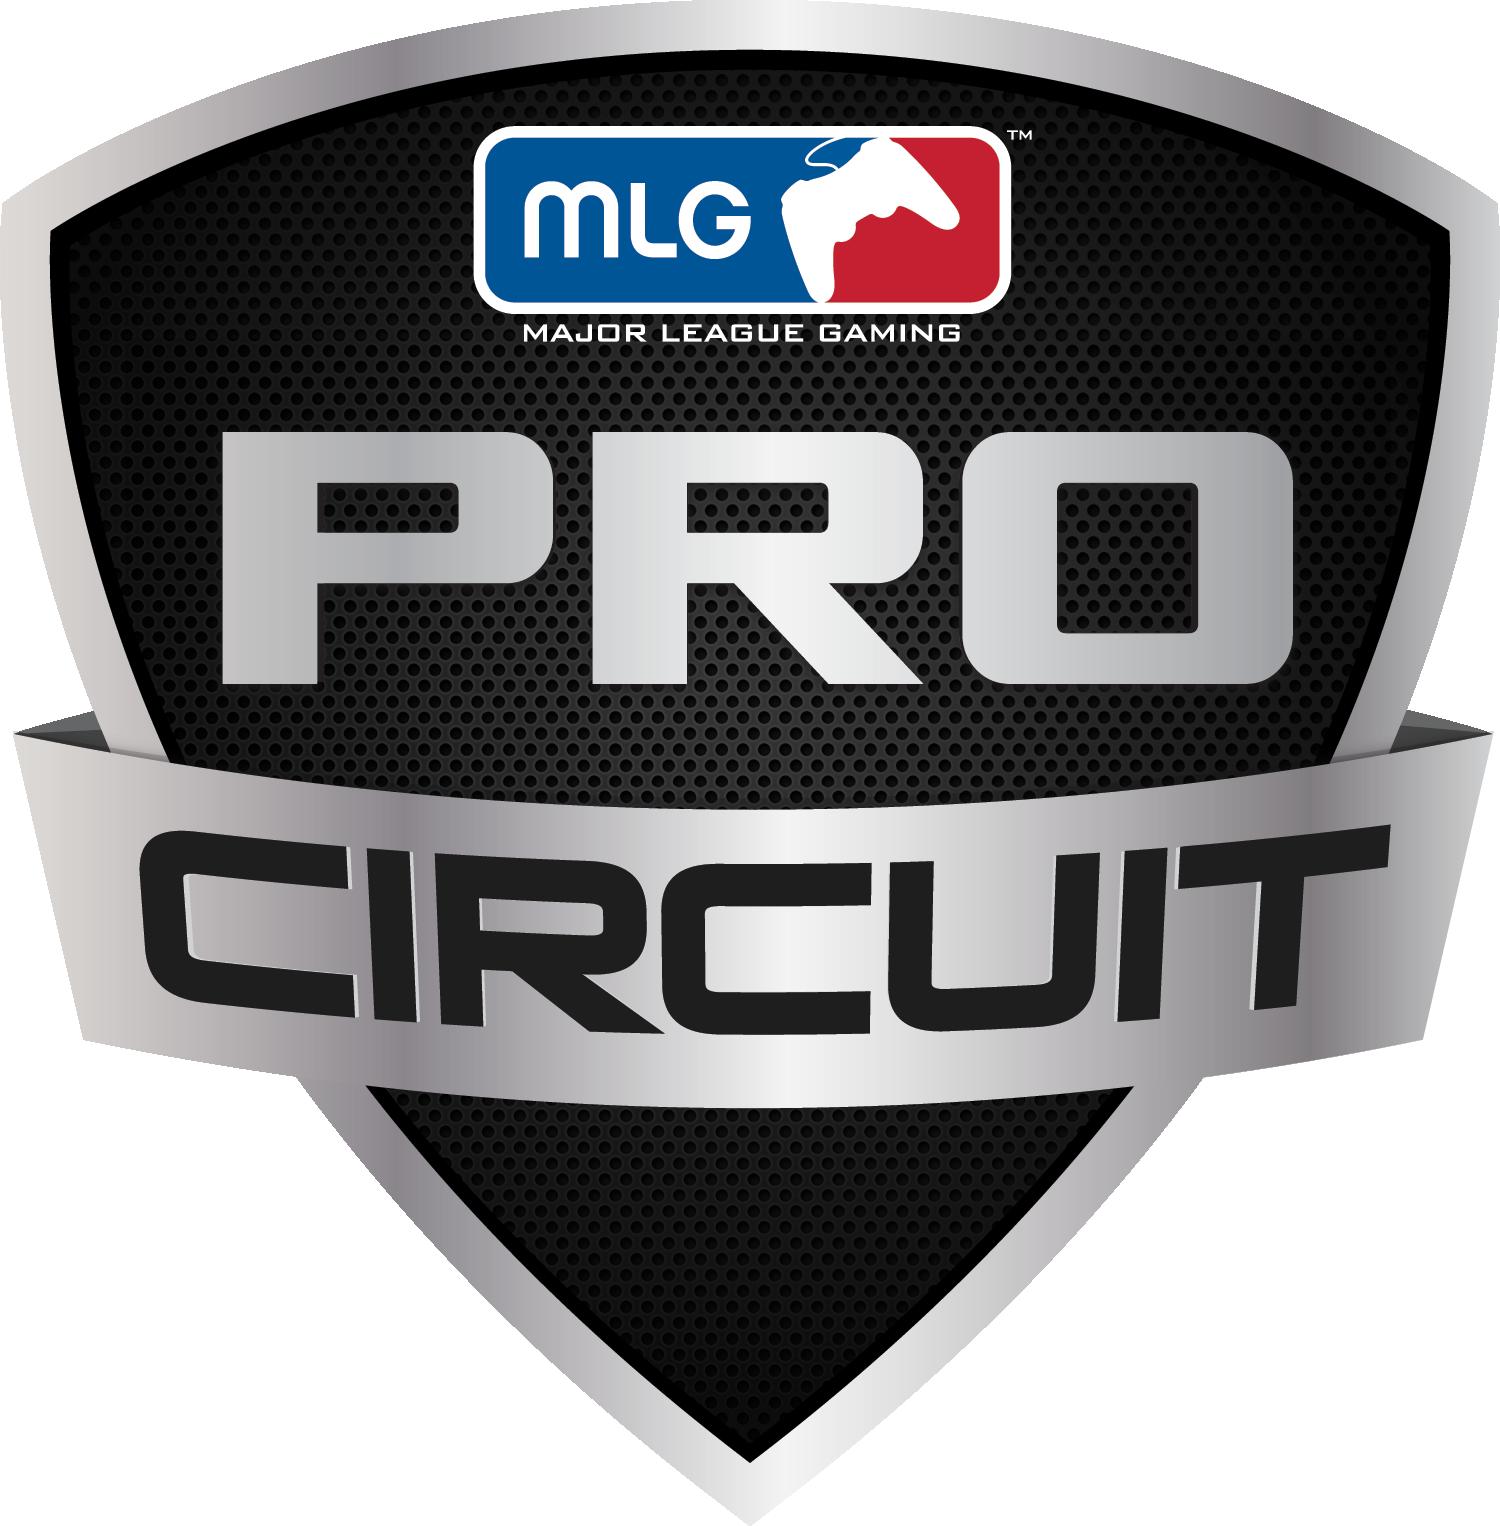 mlg pro circuit logo major league gaming